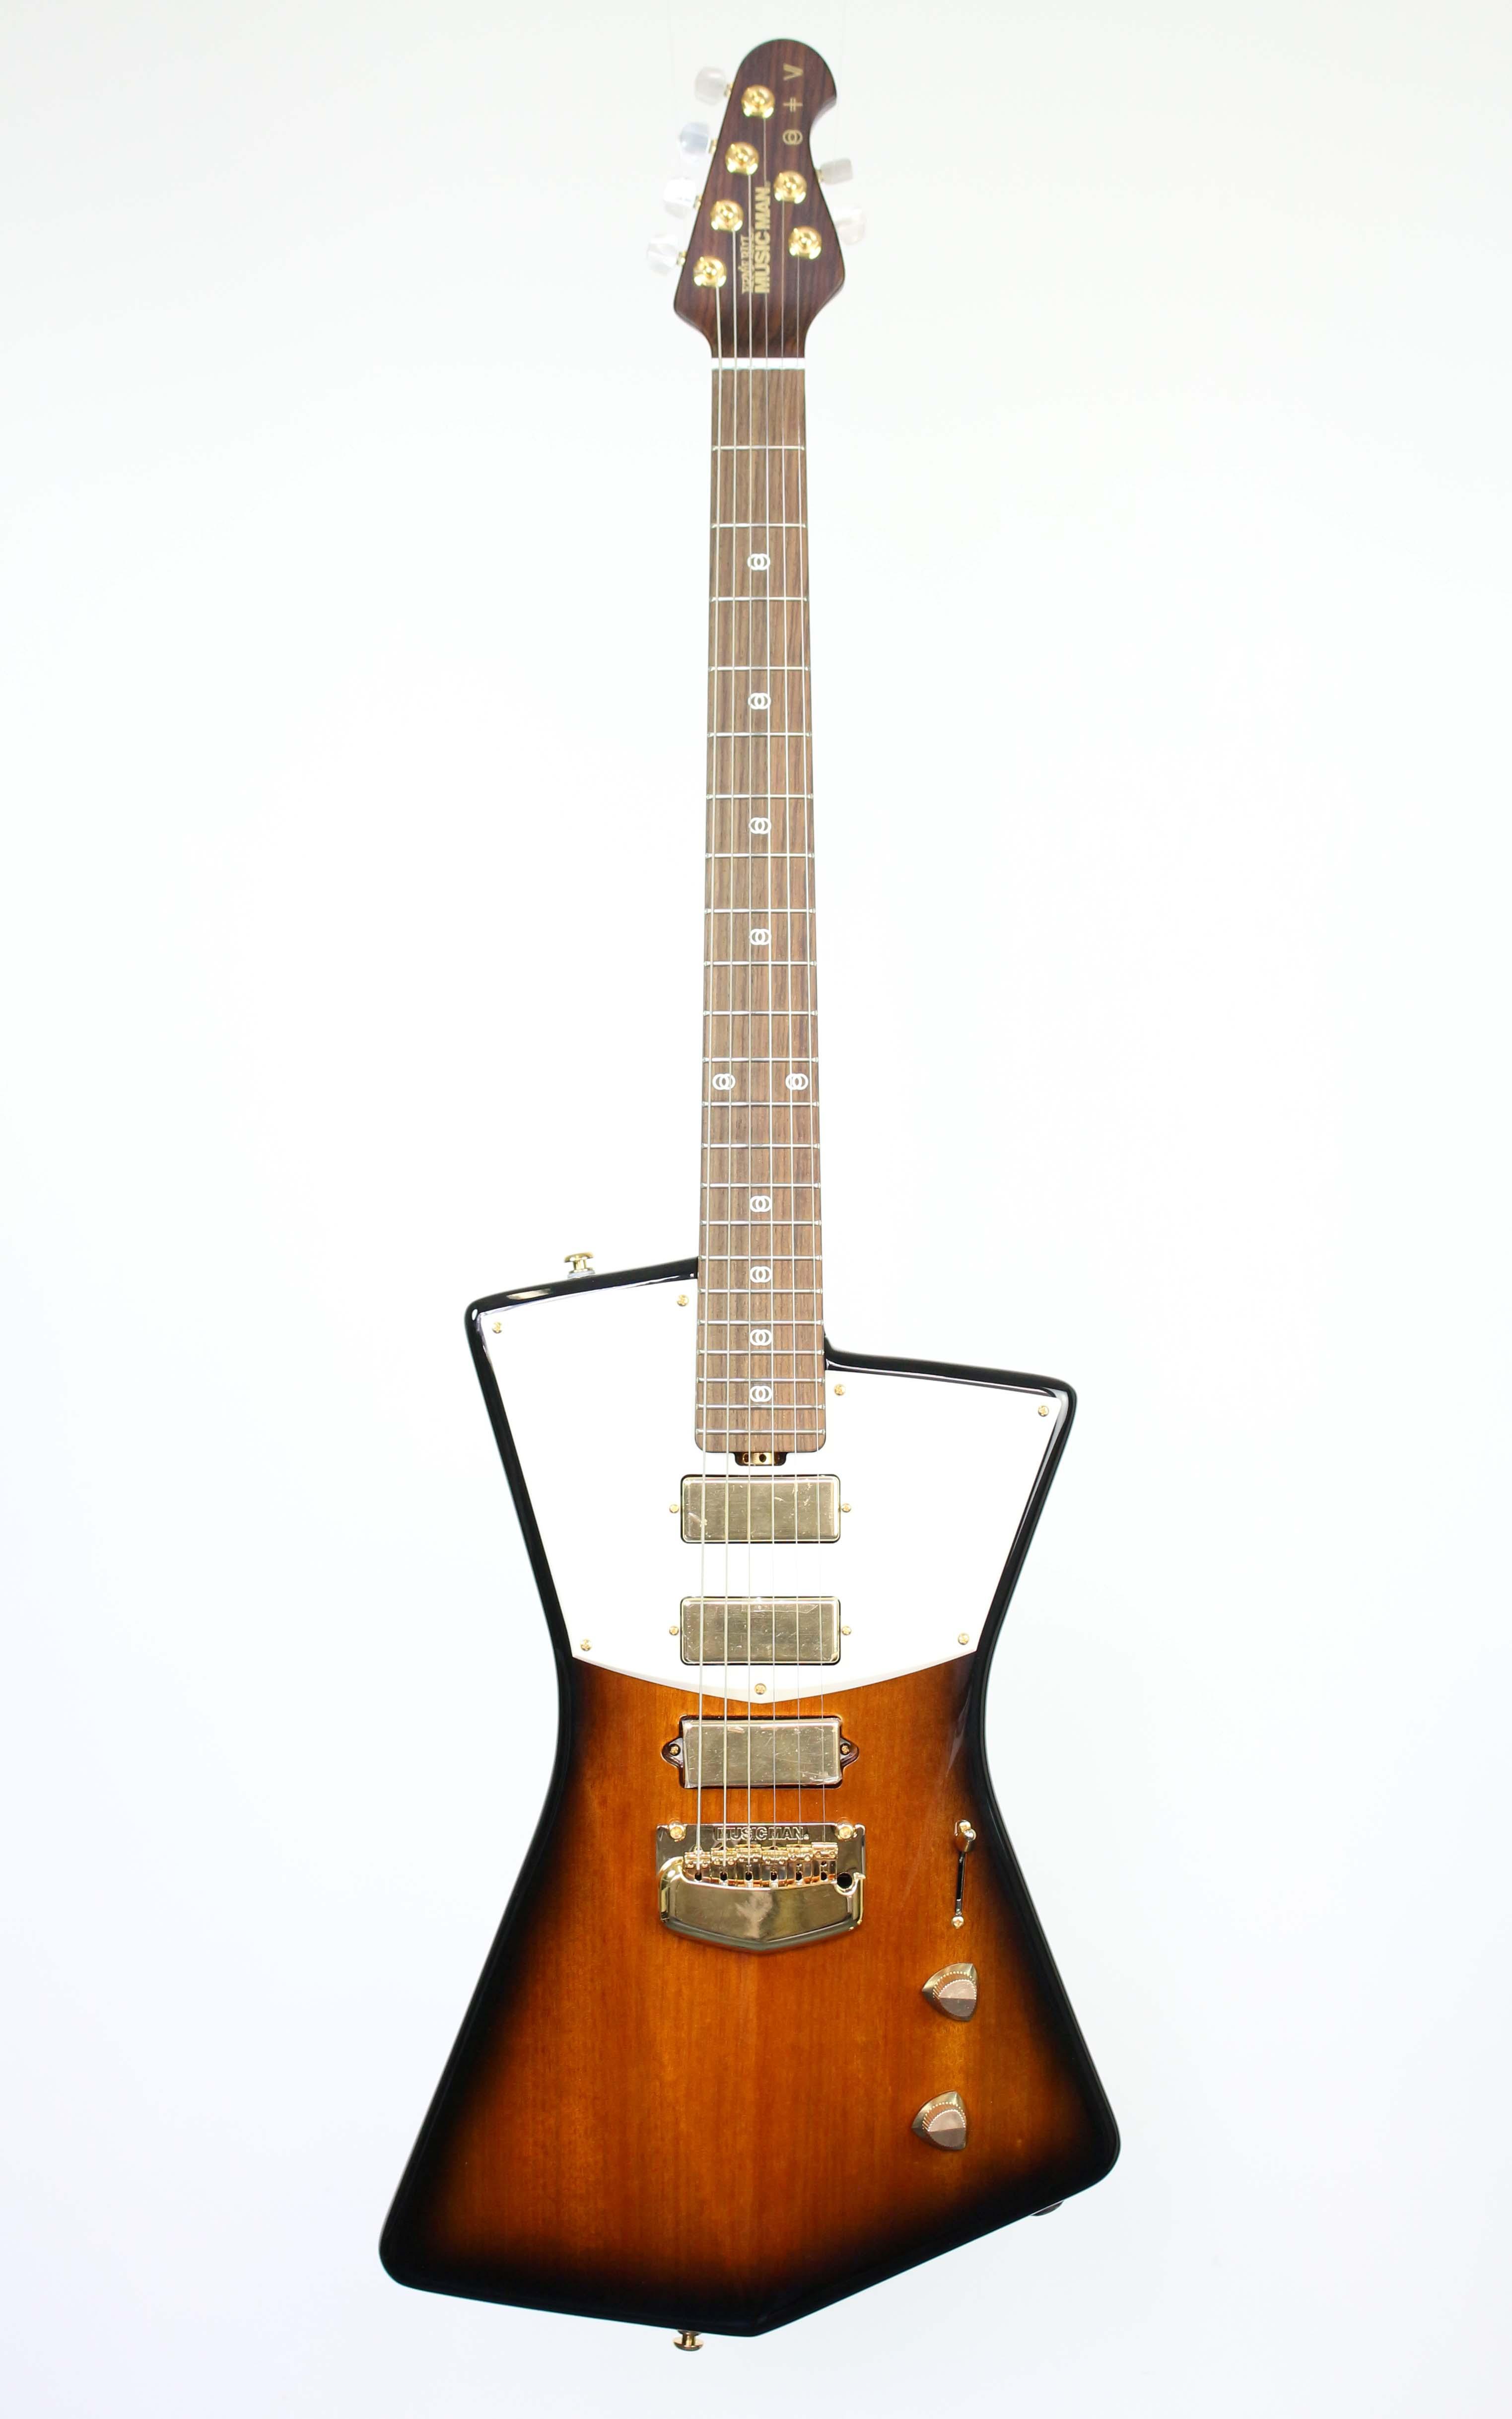 Music Man - St. Vincent HHH Tobacco Burst Limited Edition - Gitarren - E-Gitarren | MUSIK BERTRAM Deutschland Freiburg